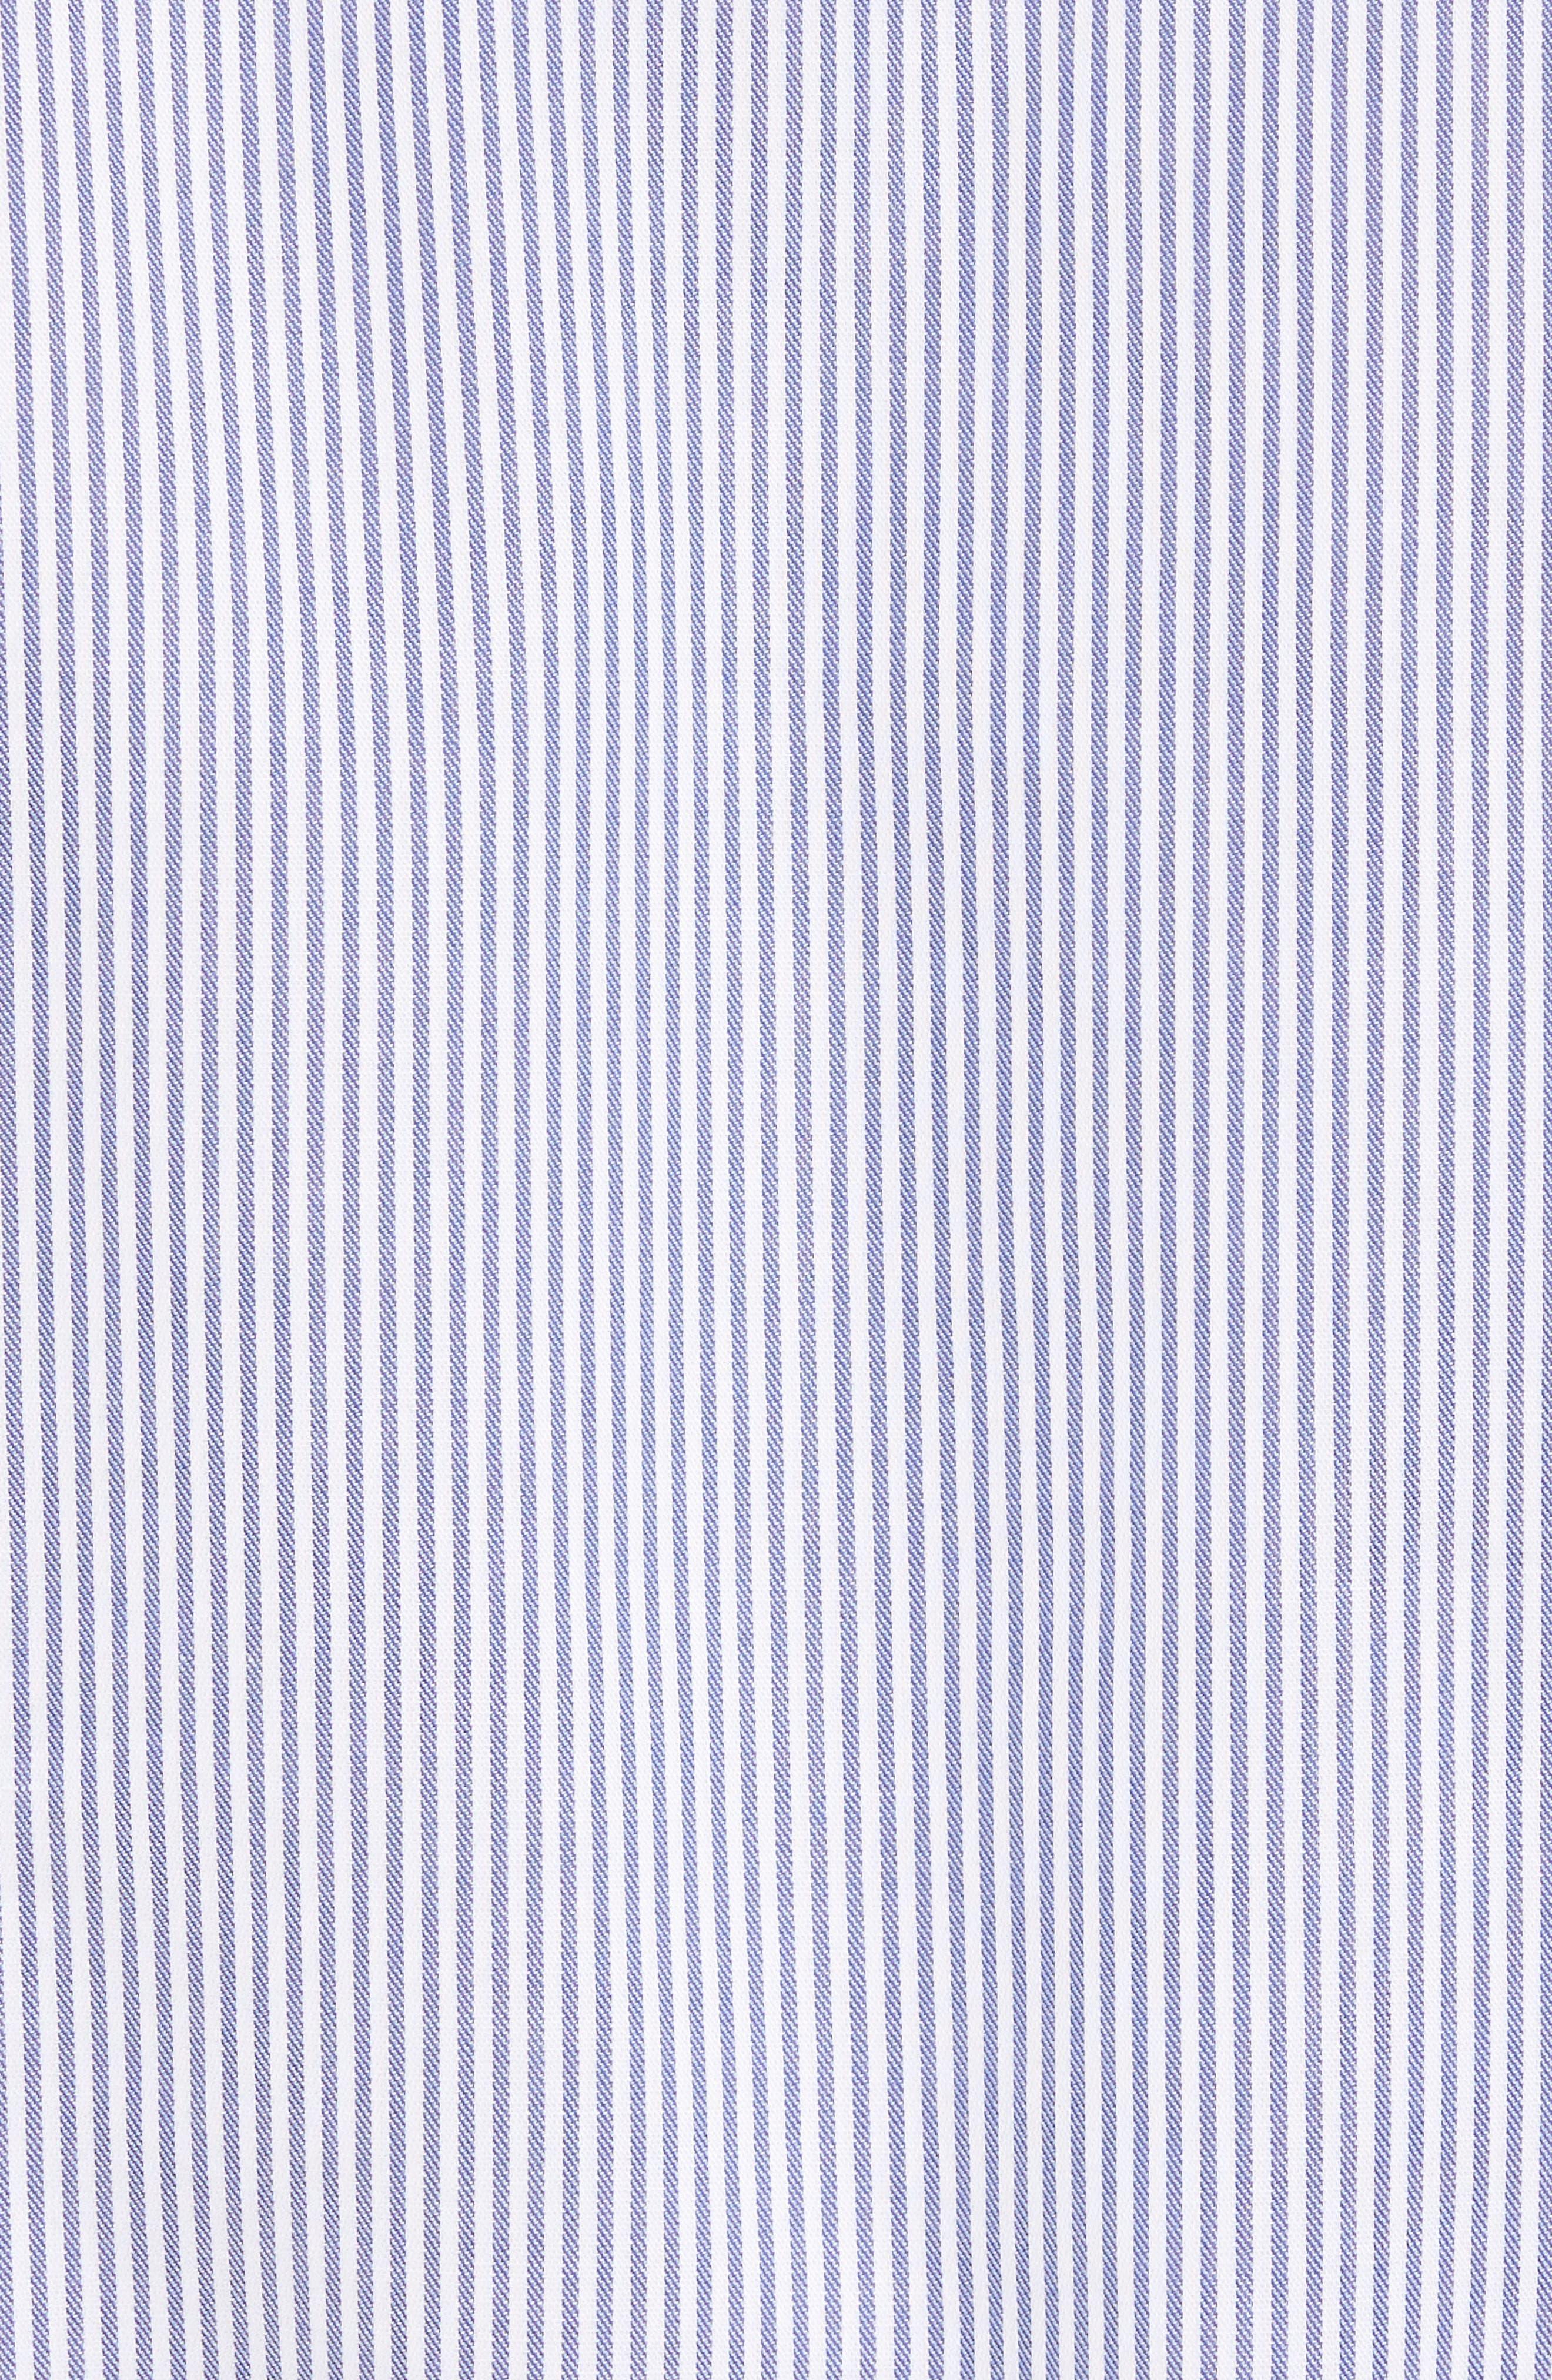 Tech-Smart Regular Fit Stripe Sport Shirt,                             Alternate thumbnail 5, color,                             Navy Iris White Stripe